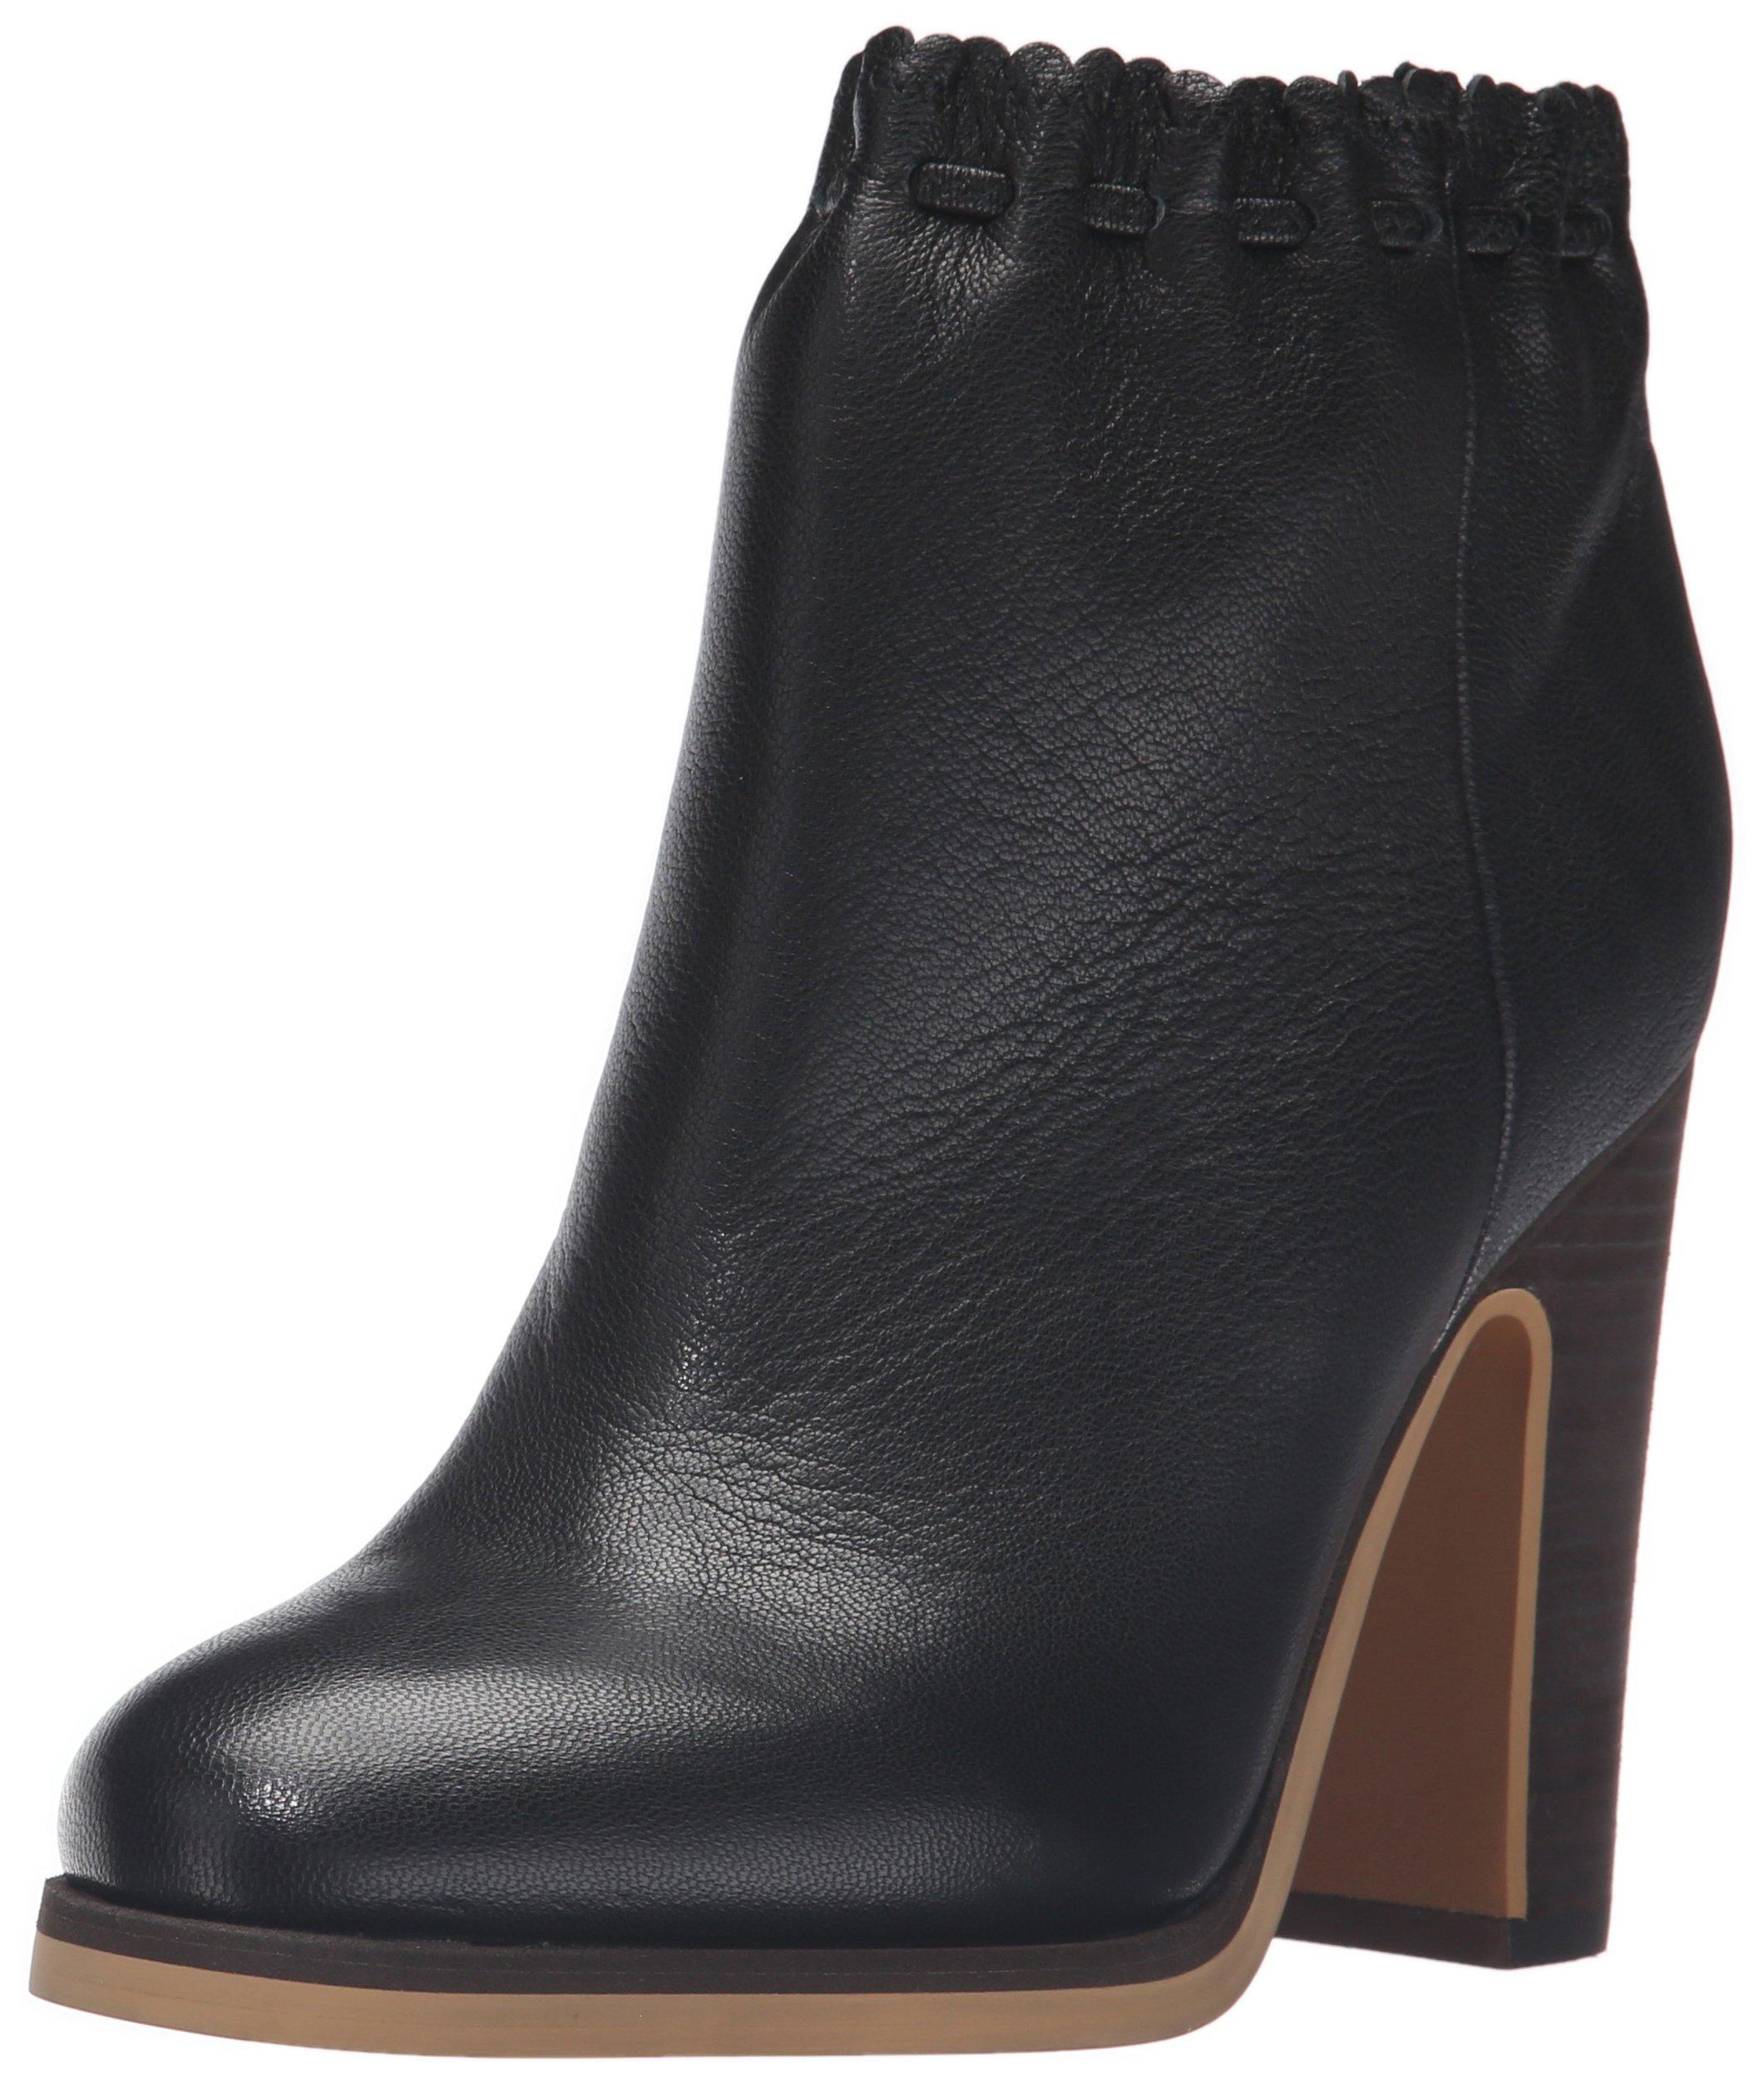 See by Chloe Women's Jane Ankle Bootie, Black, 38 EU/8 M US